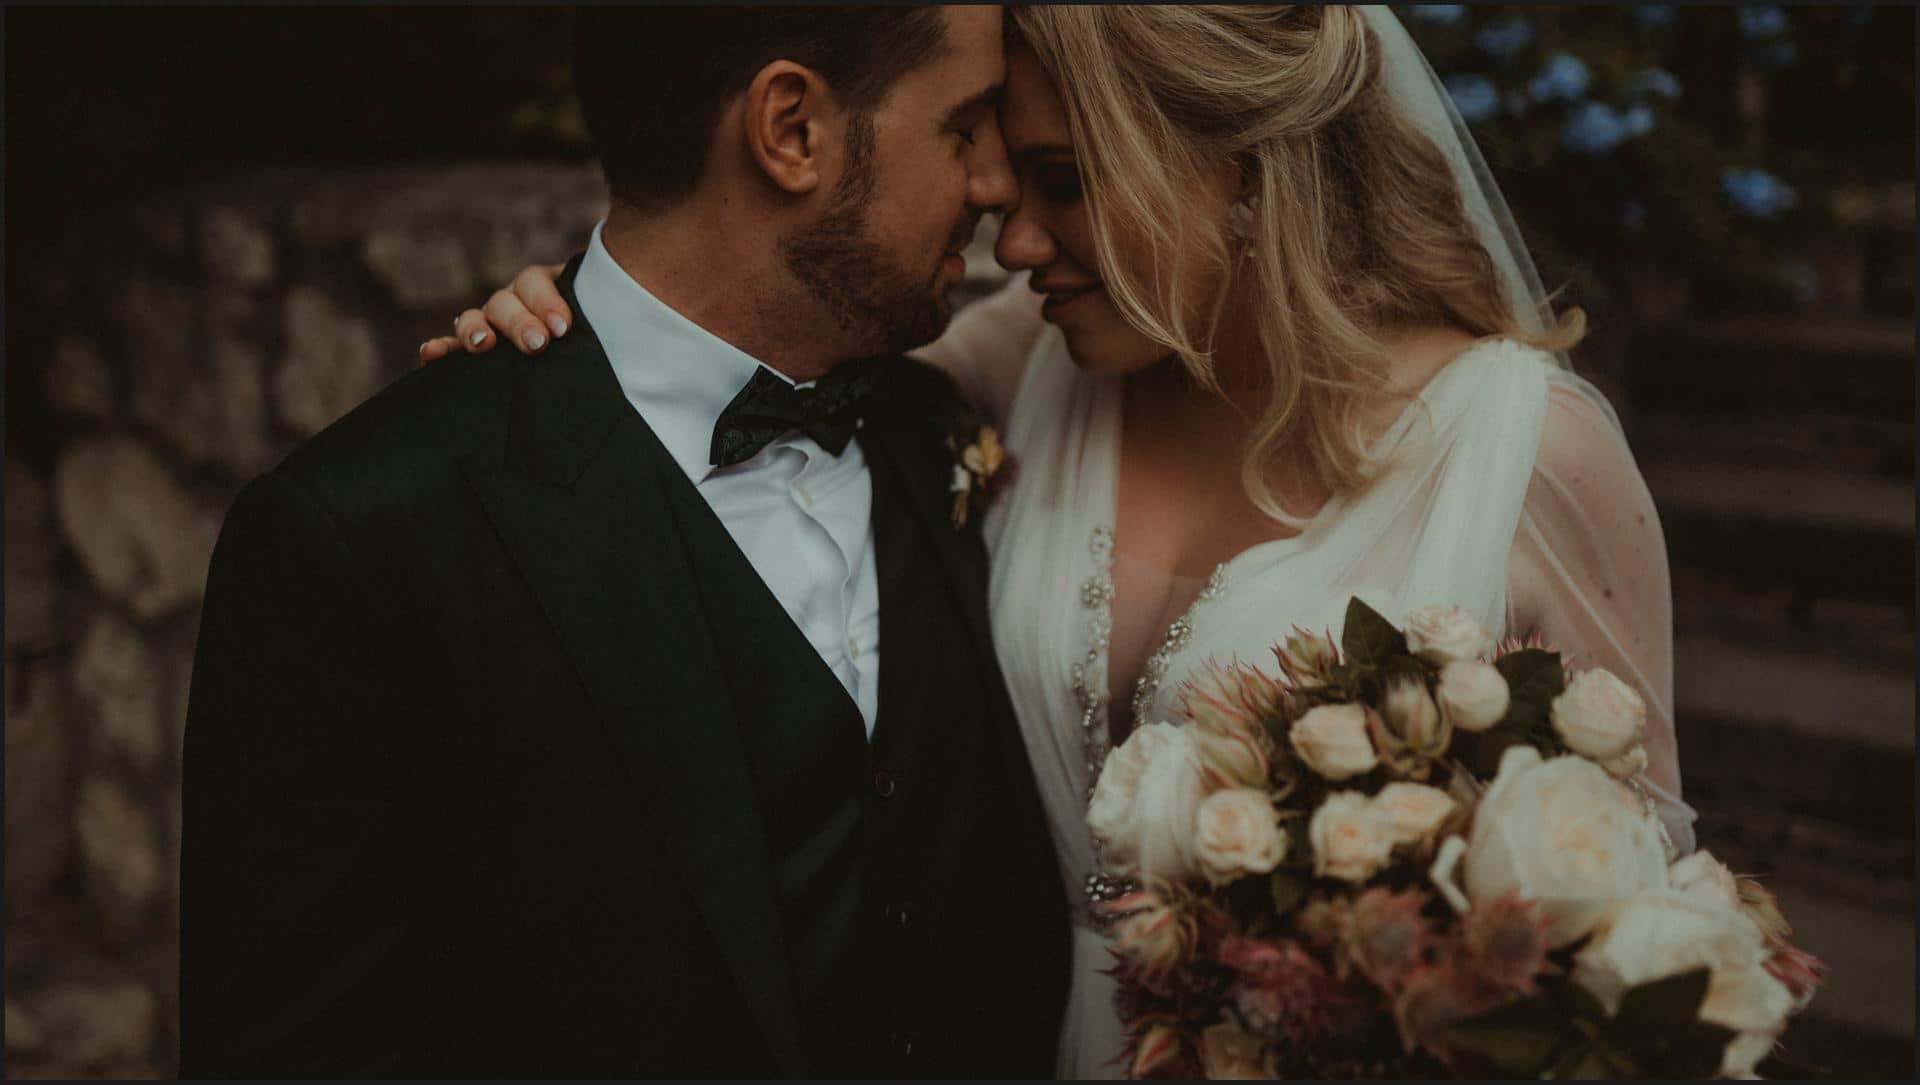 borgo di tragliata, wedding, rome, wedding in rome, flowers, bouquet, bride, groom, italy wedding photographer, destination wedding in rome, rome wedding photographer